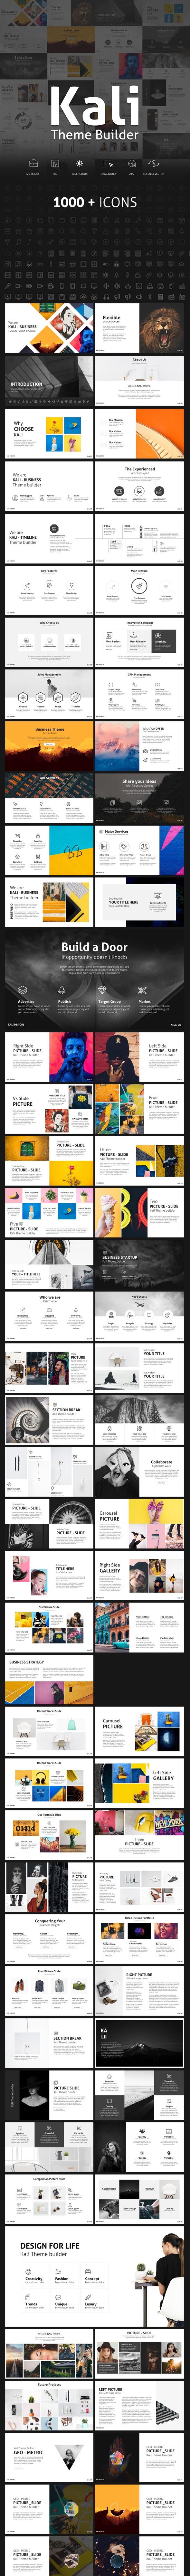 Kali Theme Builder - Minimal Presentation Template - PowerPoint Templates Presentation Templates